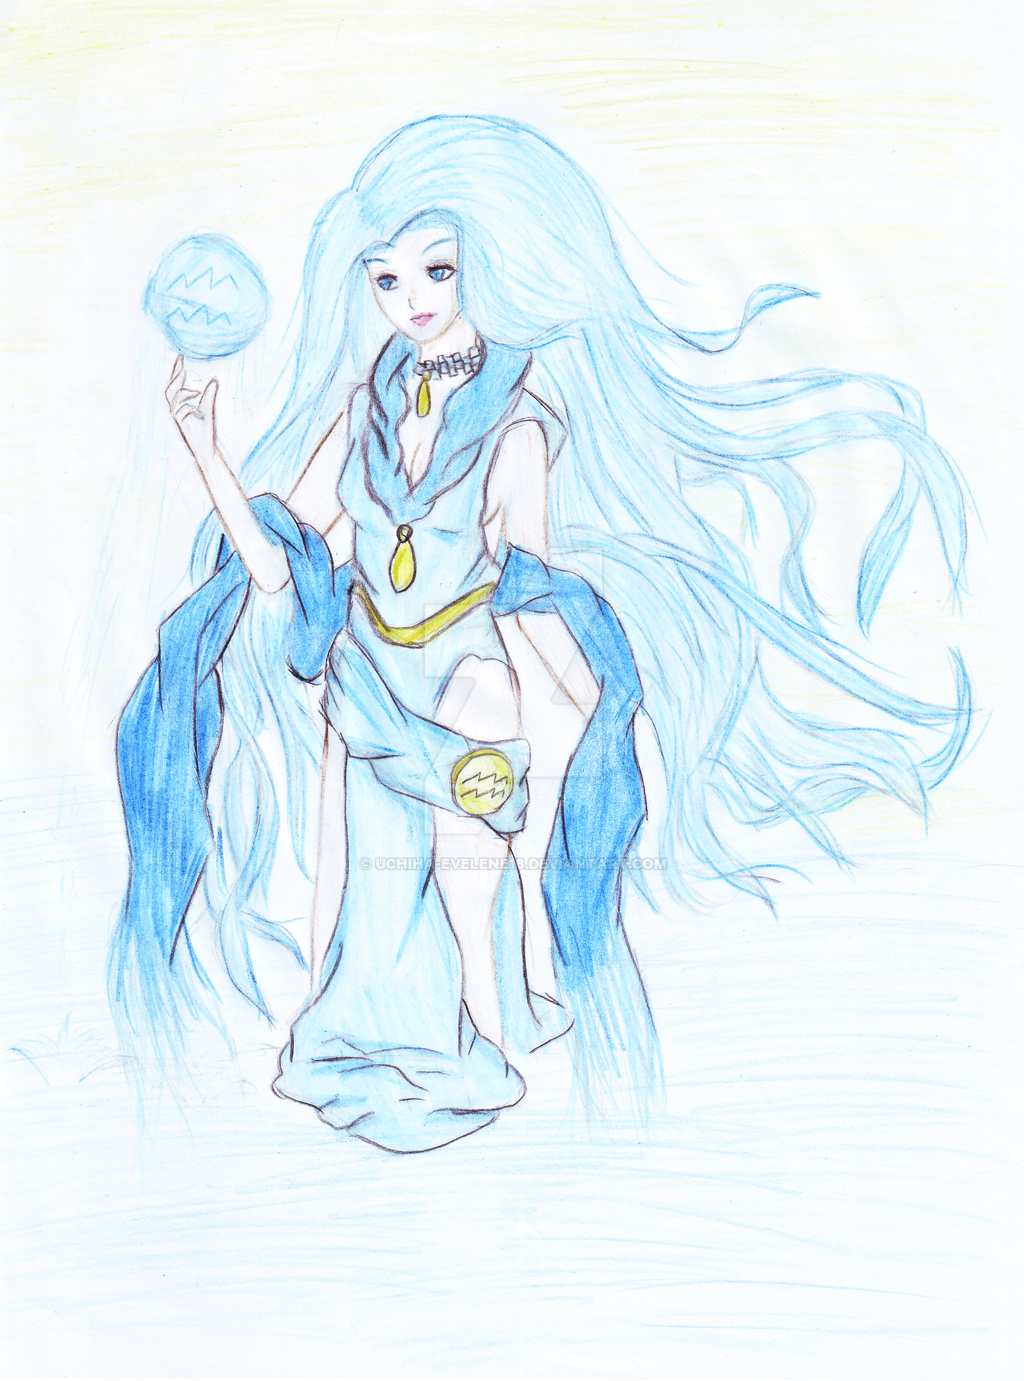 Aquarius (Female) by Uchiha-Evelene18 on DeviantArt  Anime Aquarius